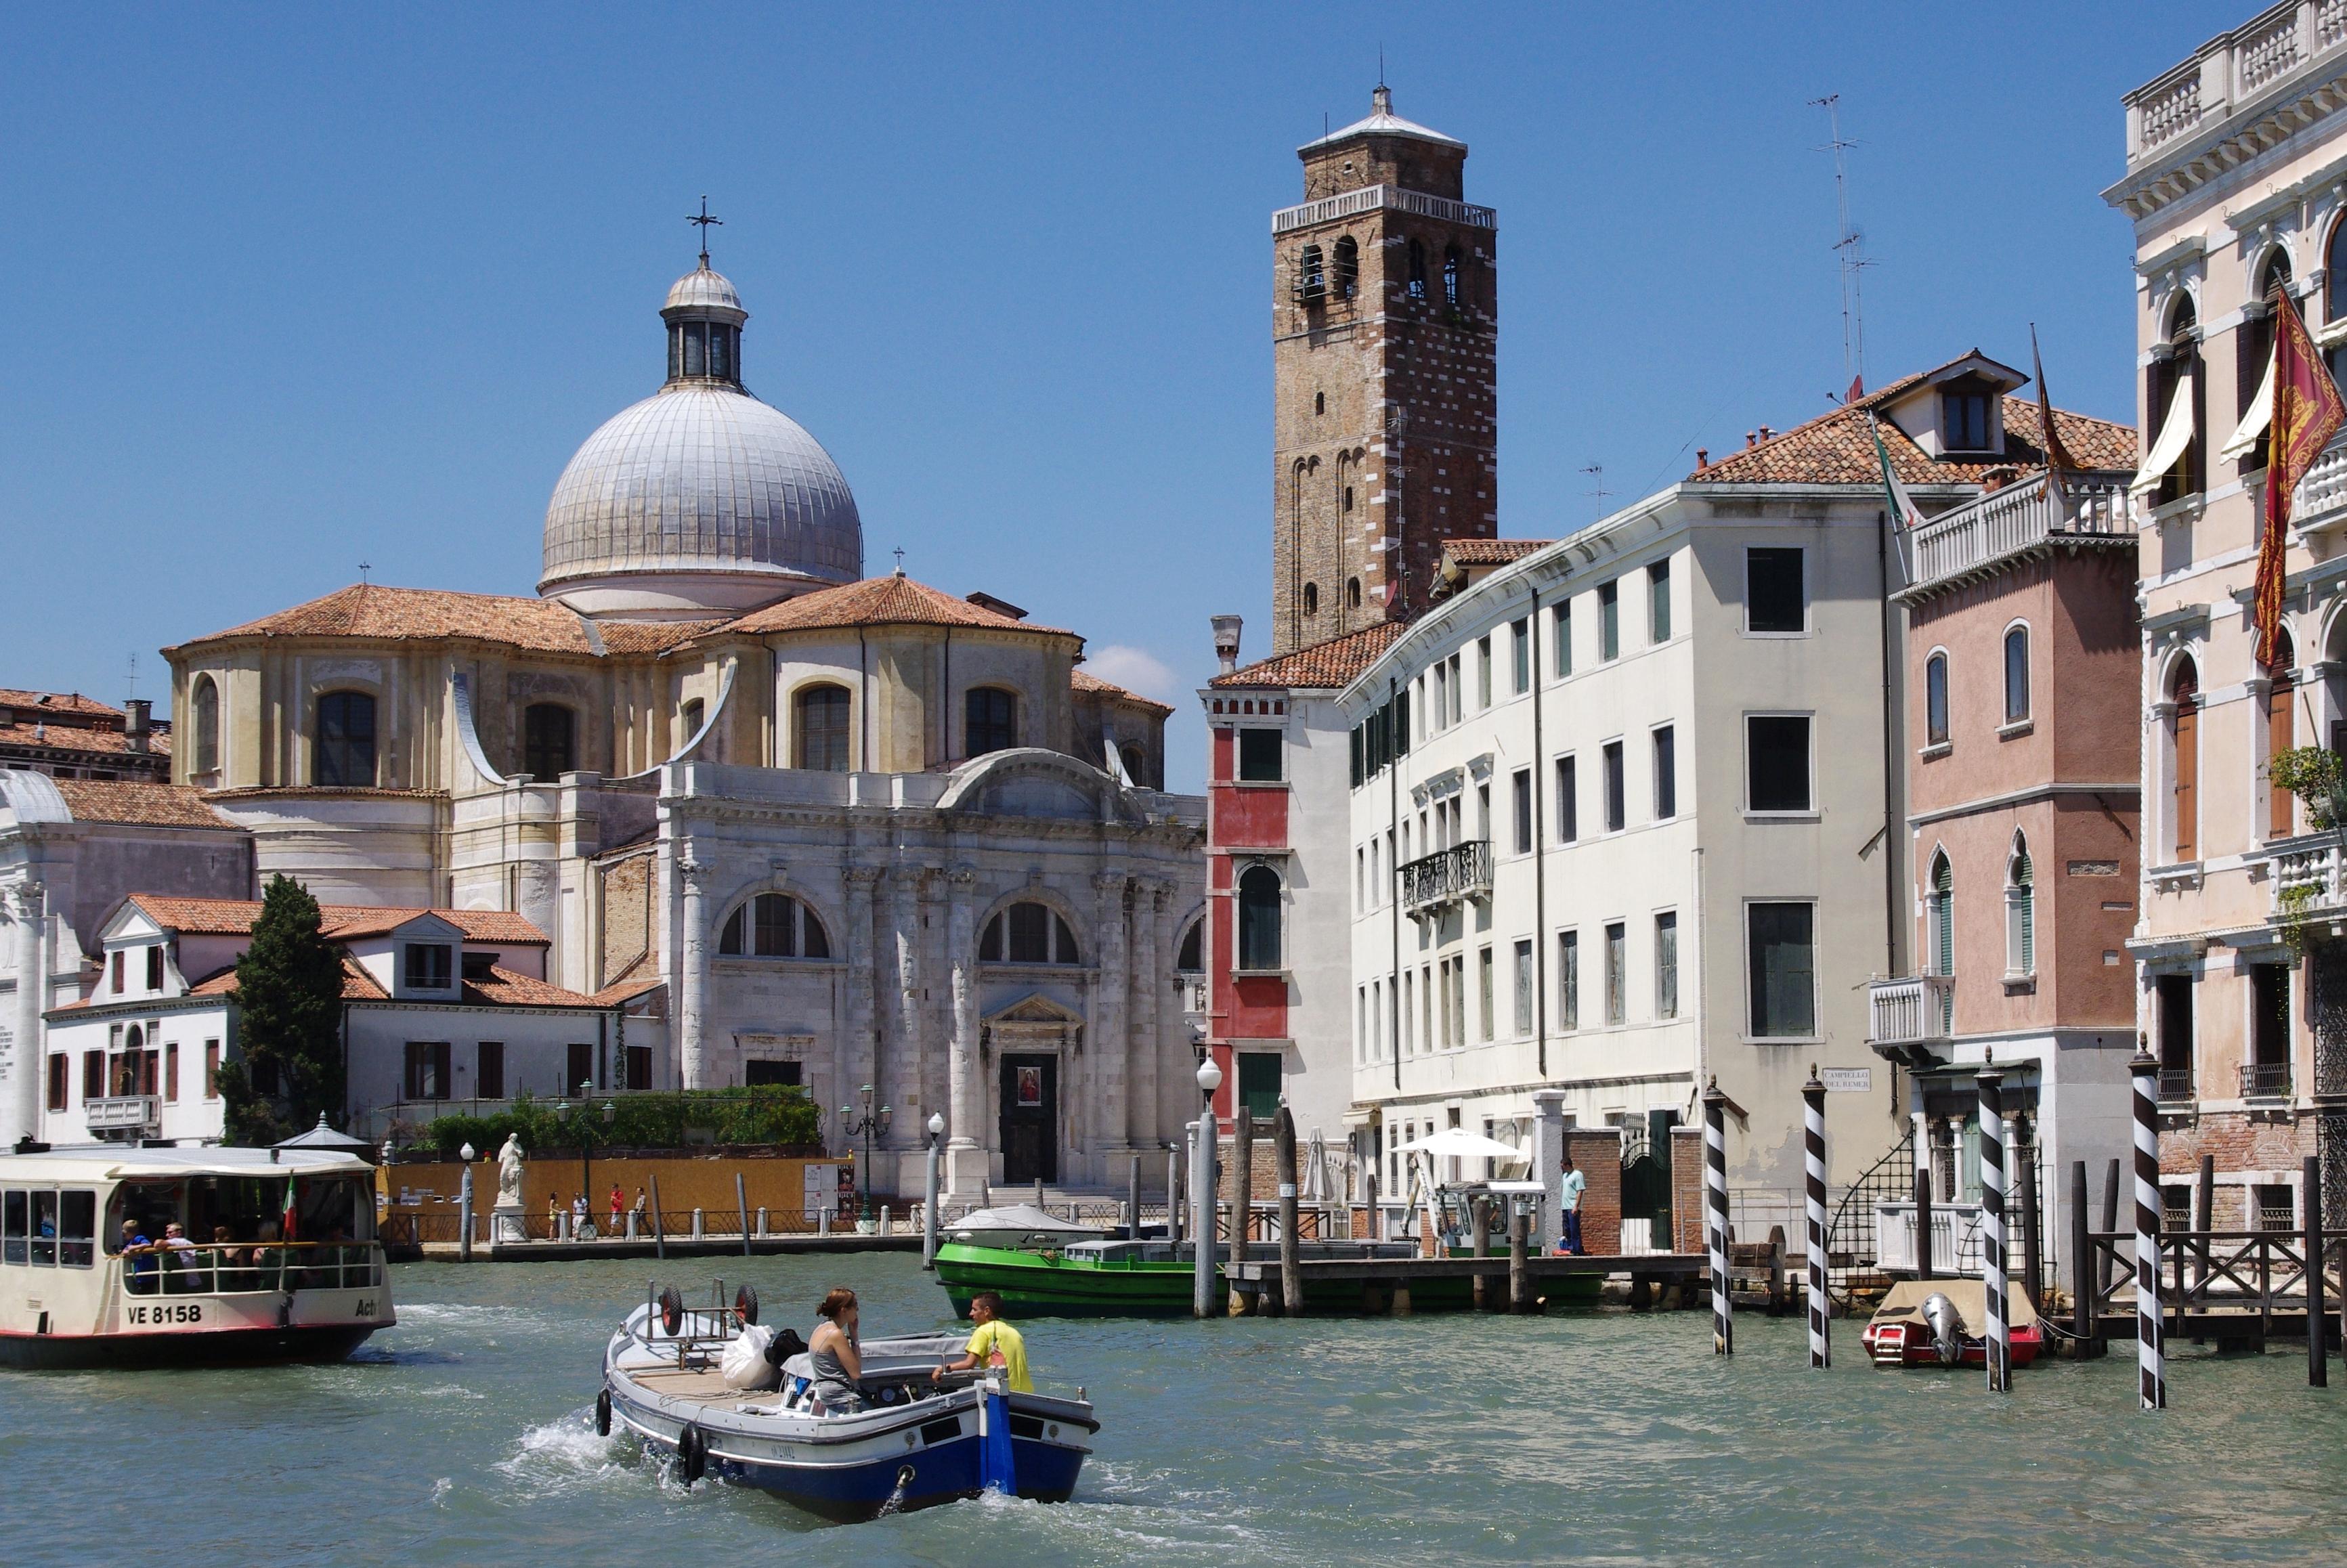 Arredamento Infanzia : Chiesa di san geremia venezia notizie